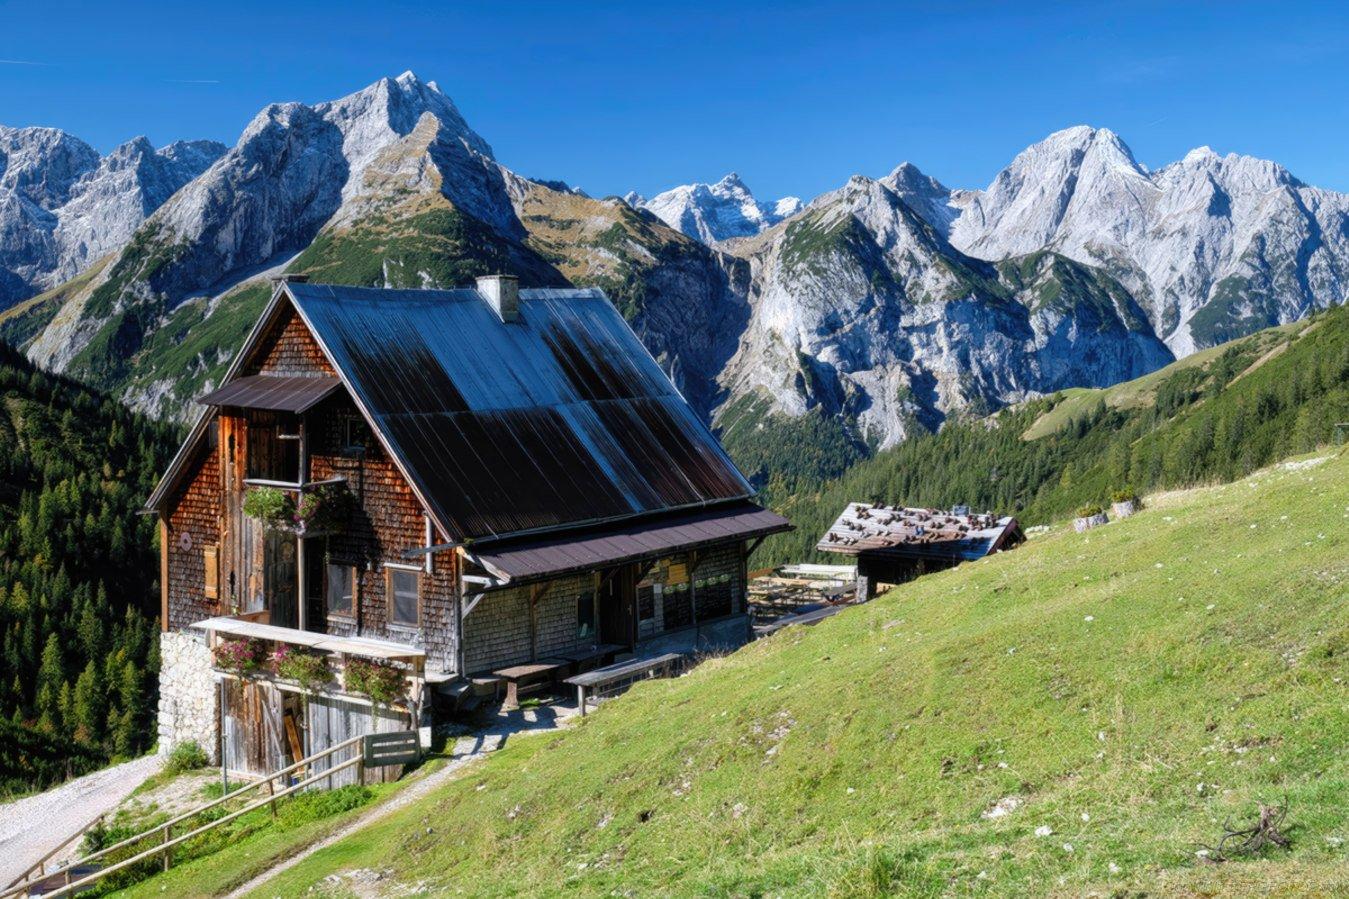 Plumsjochhütte 1630m im Karwendel